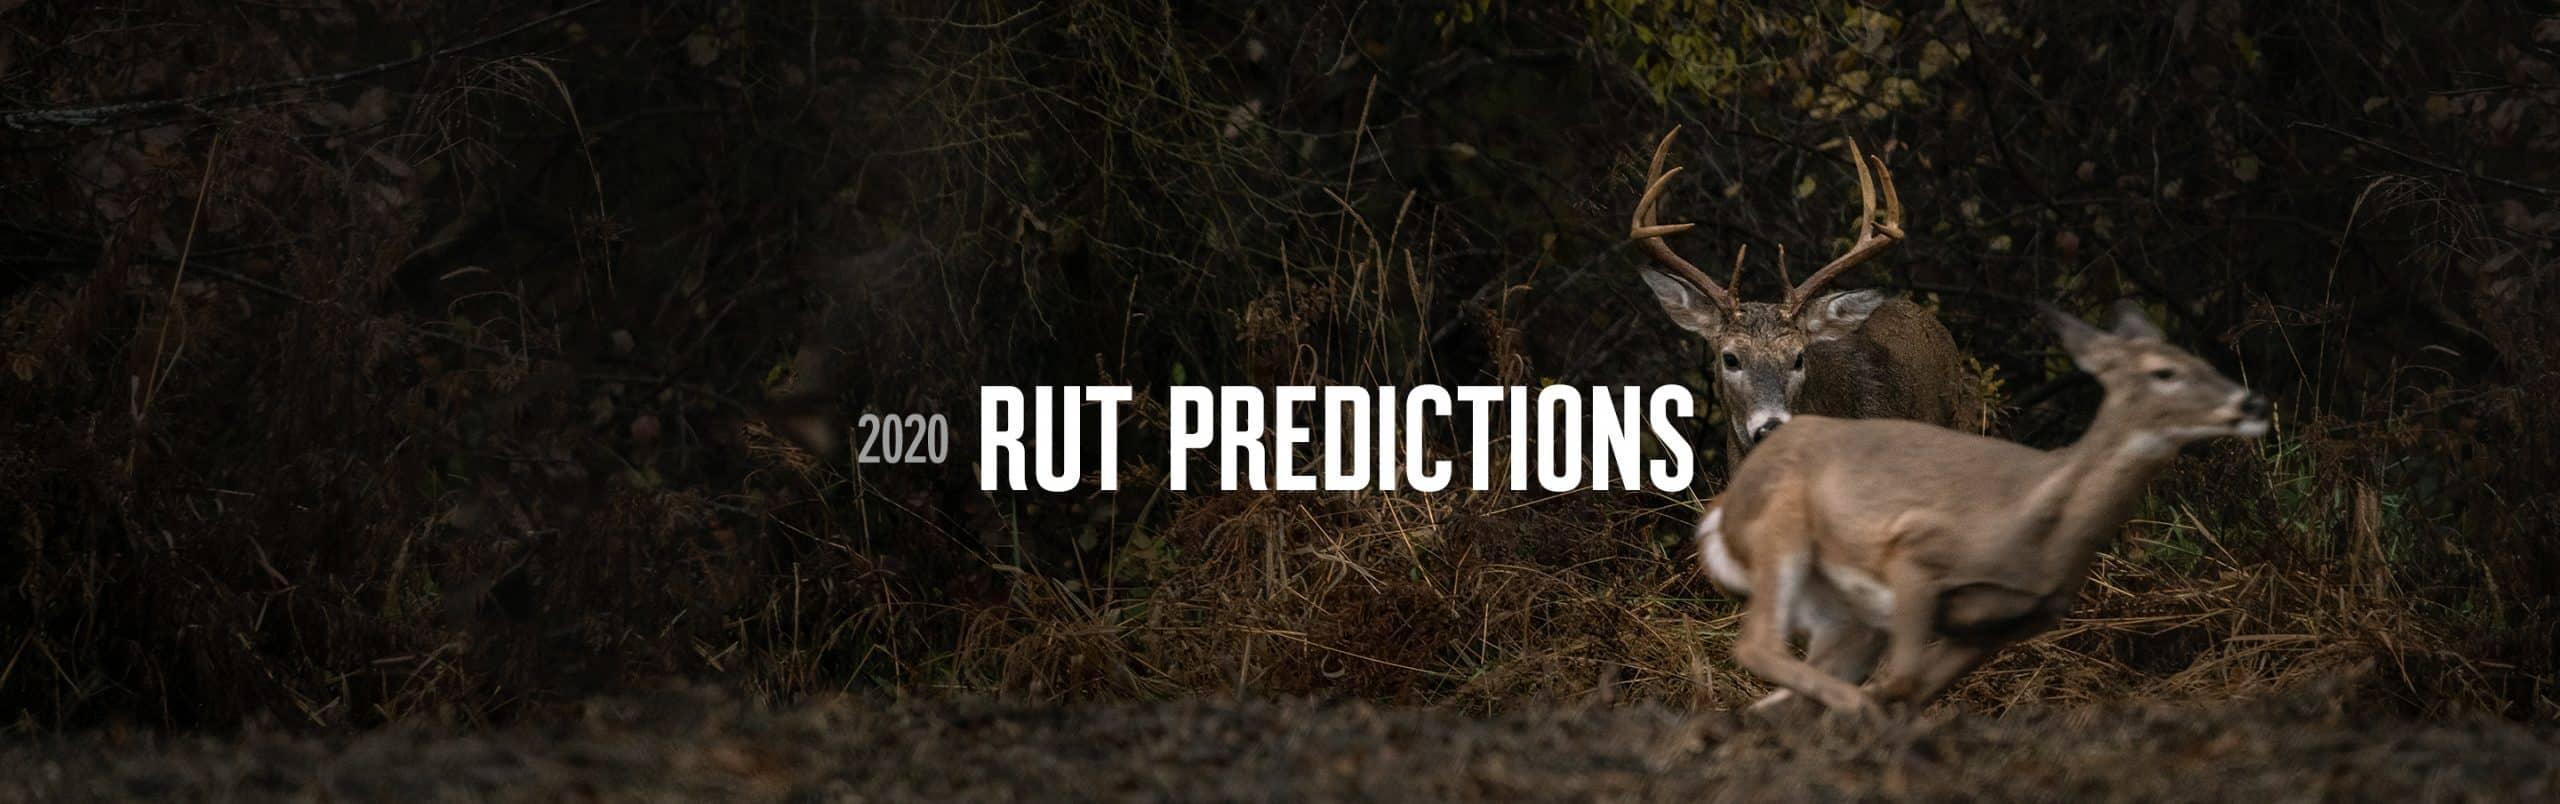 2020 Rut Predictions | Onx Maps inside Nys Deer Rut Prediction Dates